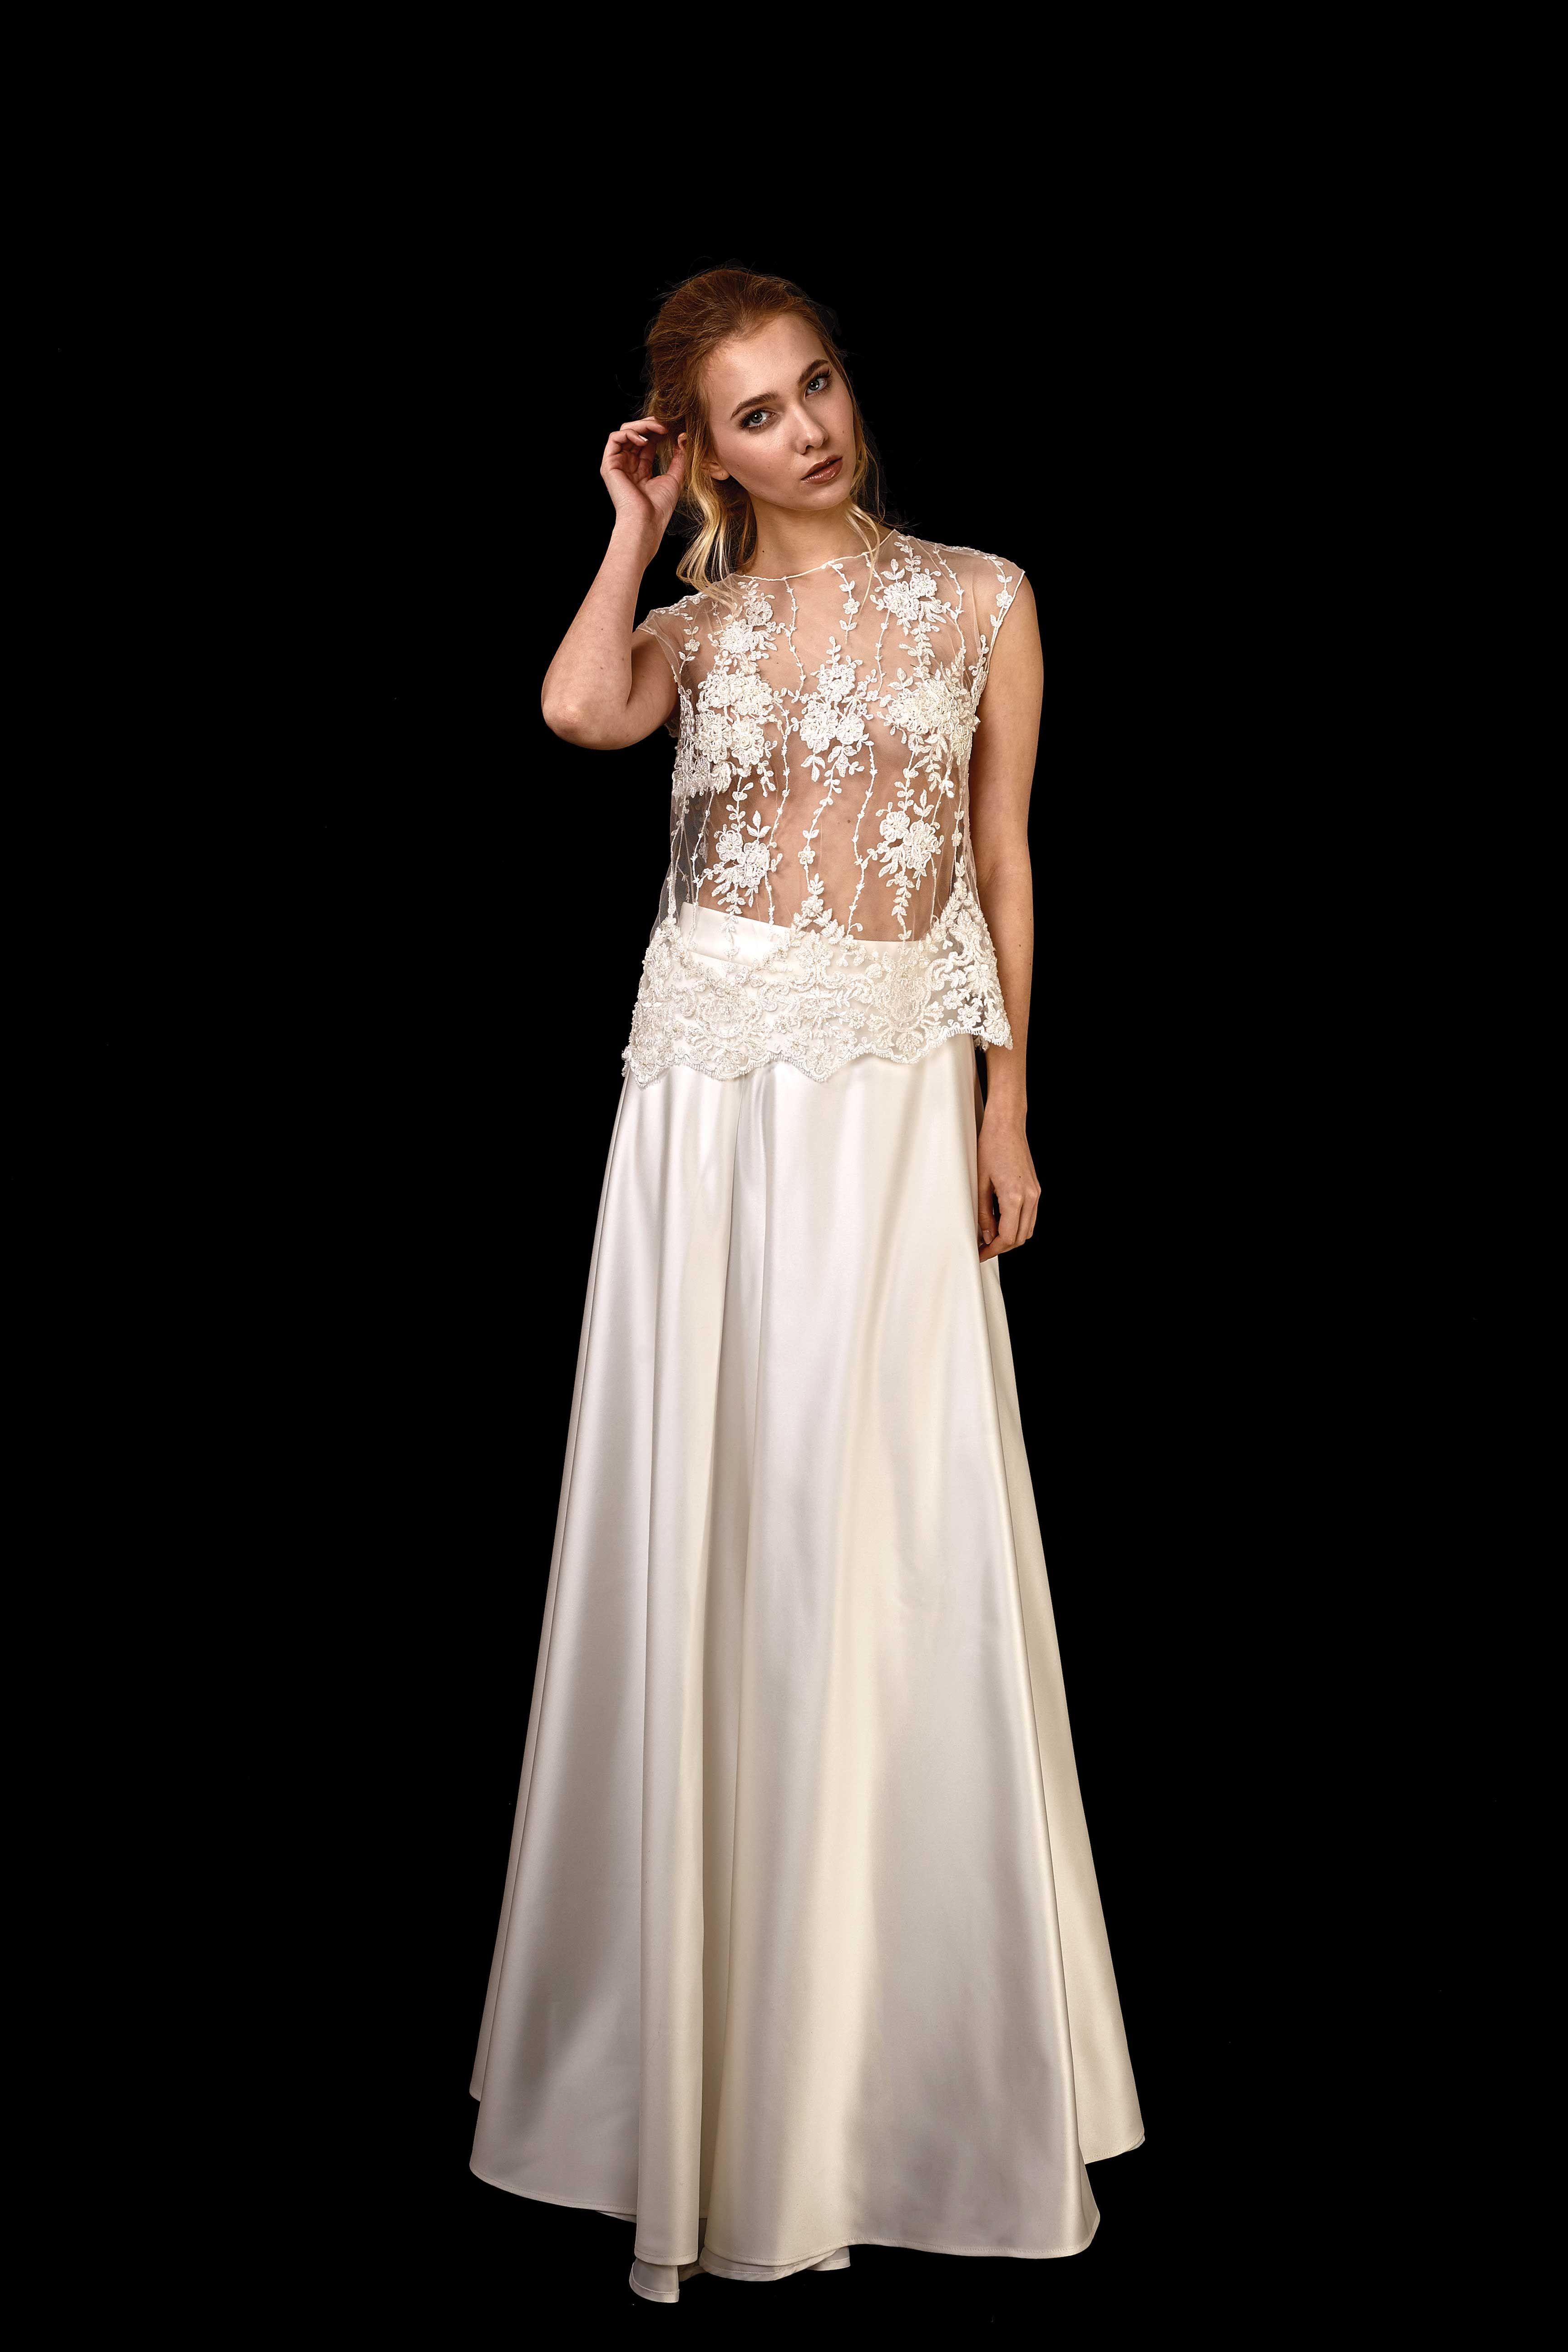 Pin auf MIX & MATCH - COMBINATIONS: YOUR INDIVIDUAL WEDDING DRESS